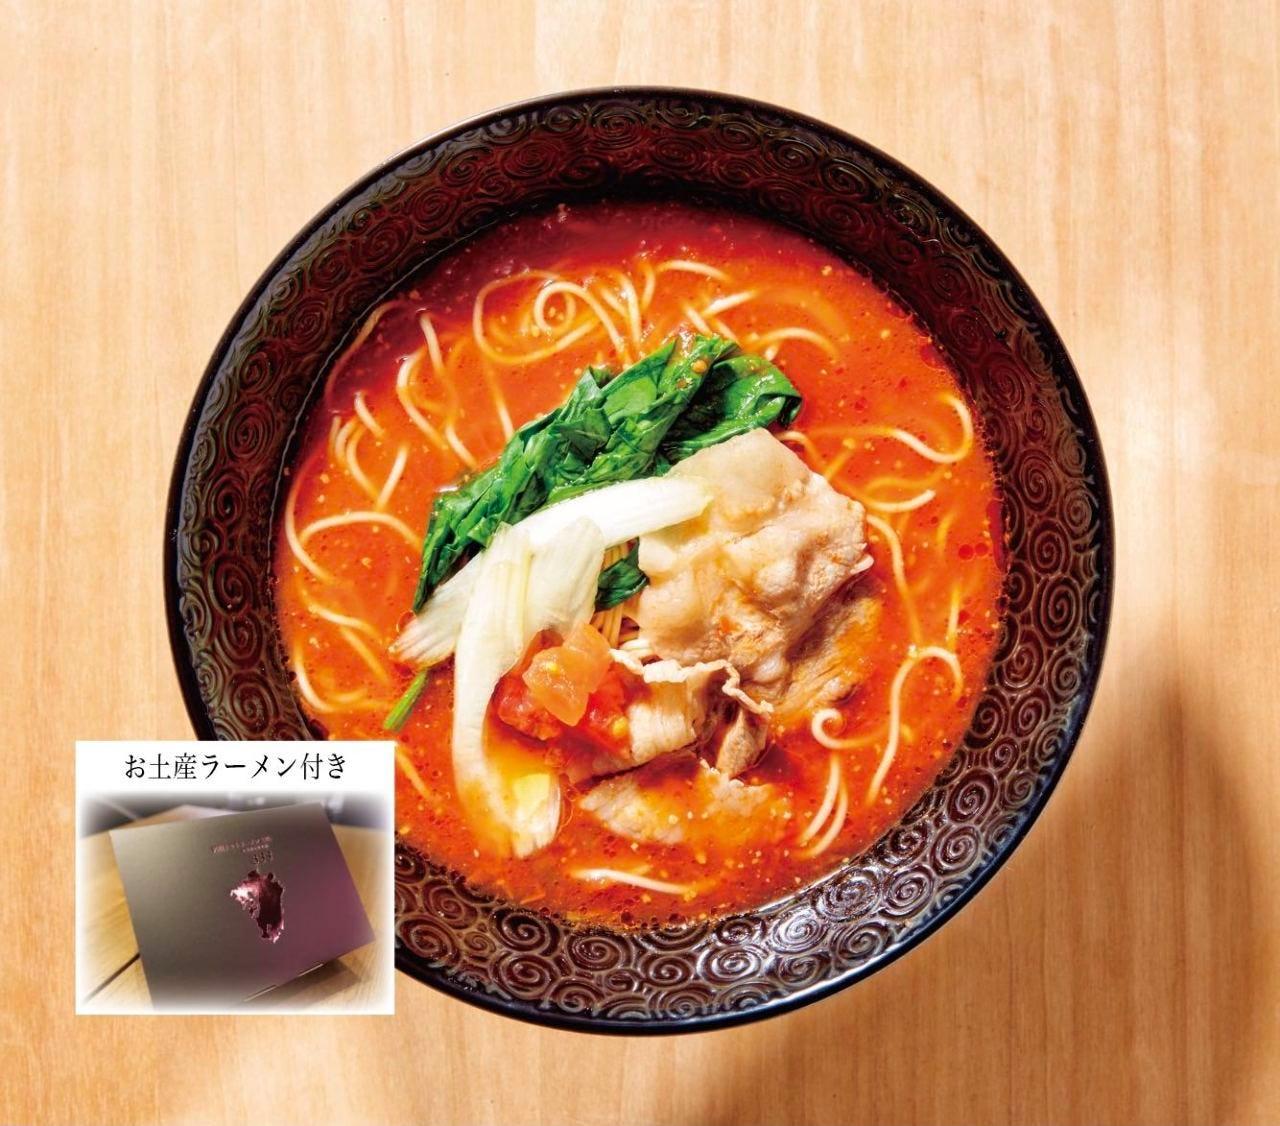 A【限定1000円】☆高級化粧箱お土産付き☆トマトラーメン+(お土産冷凍トマトラーメン)セット